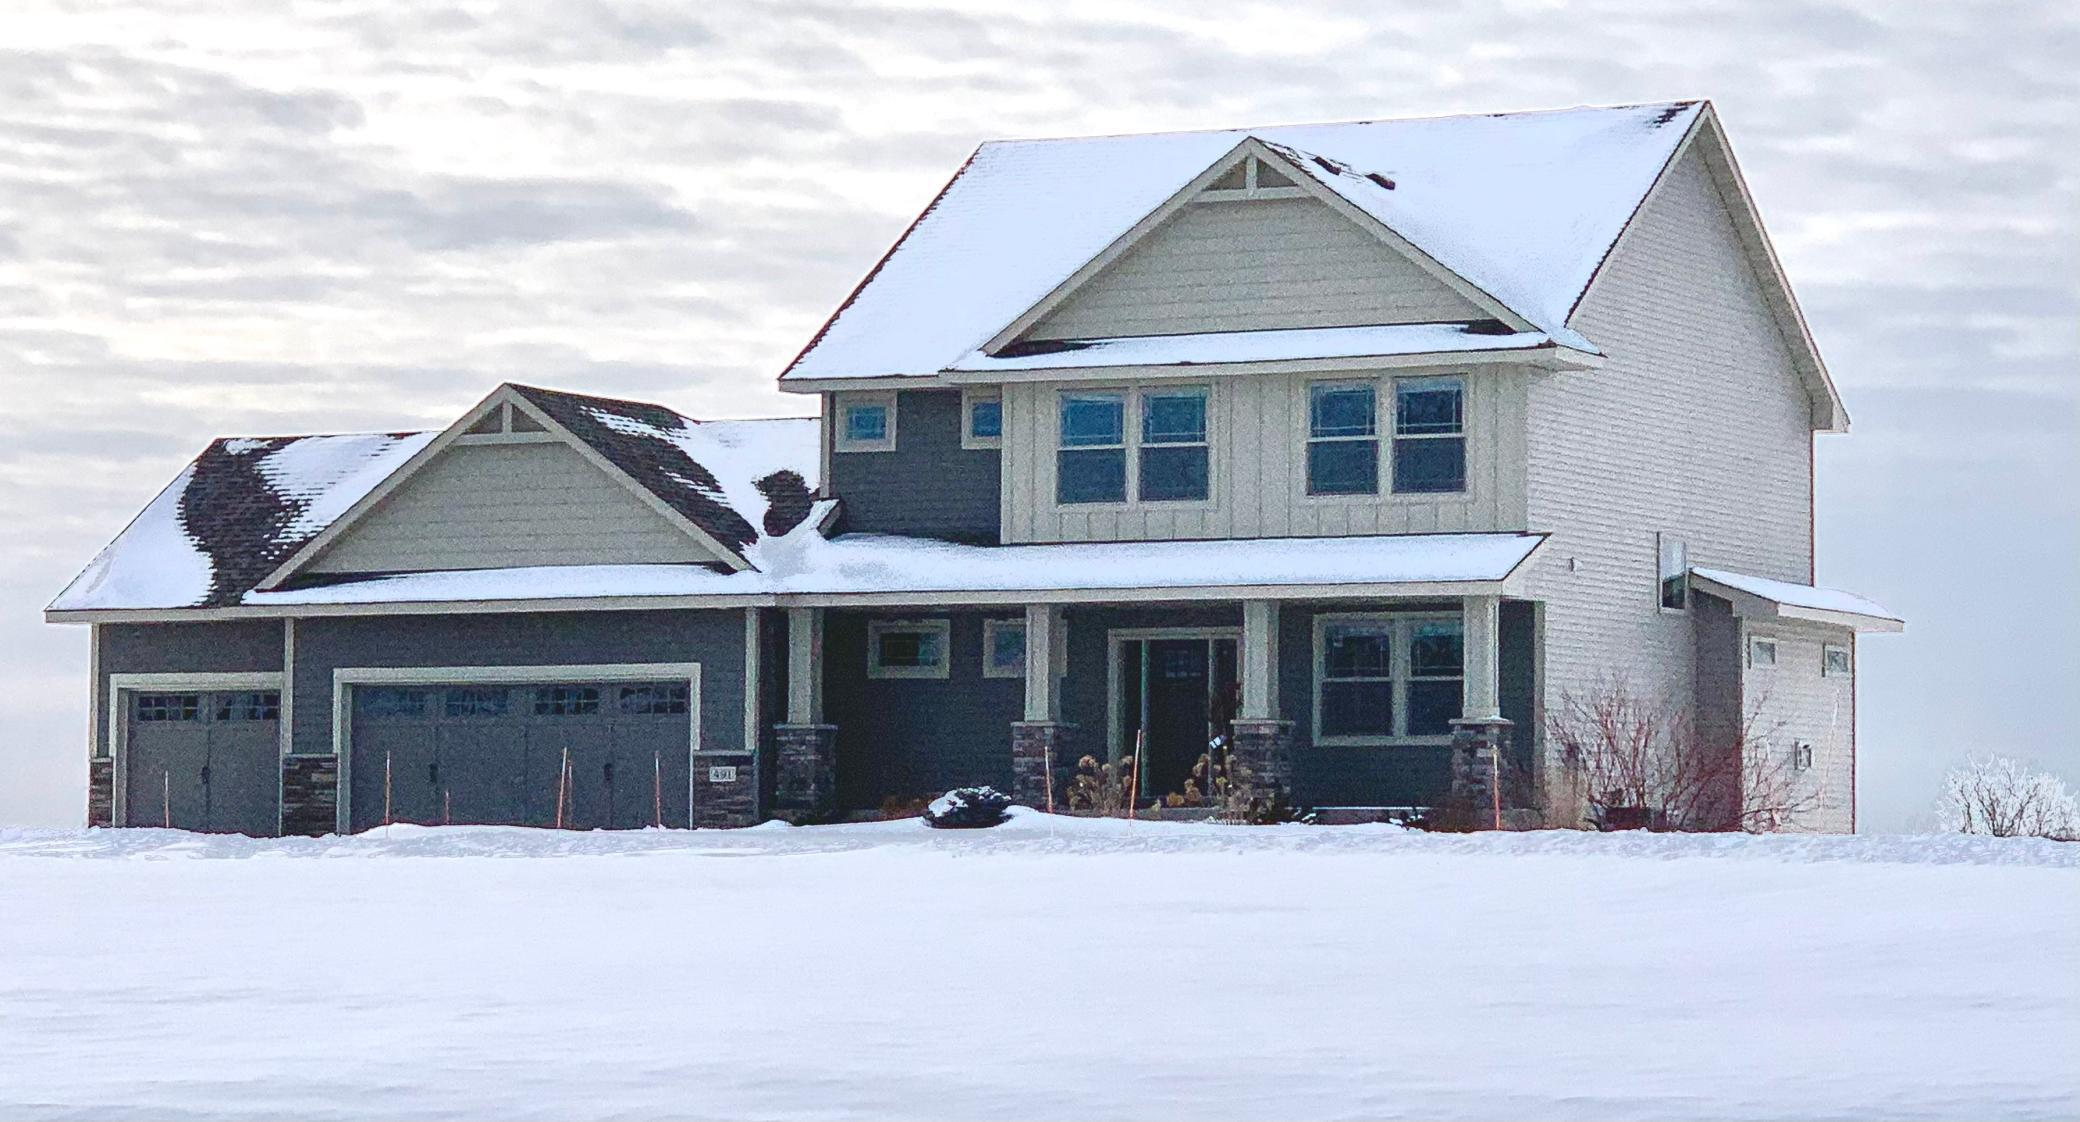 491 146th Avenue Property Photo - Saint Joseph Twp, WI real estate listing